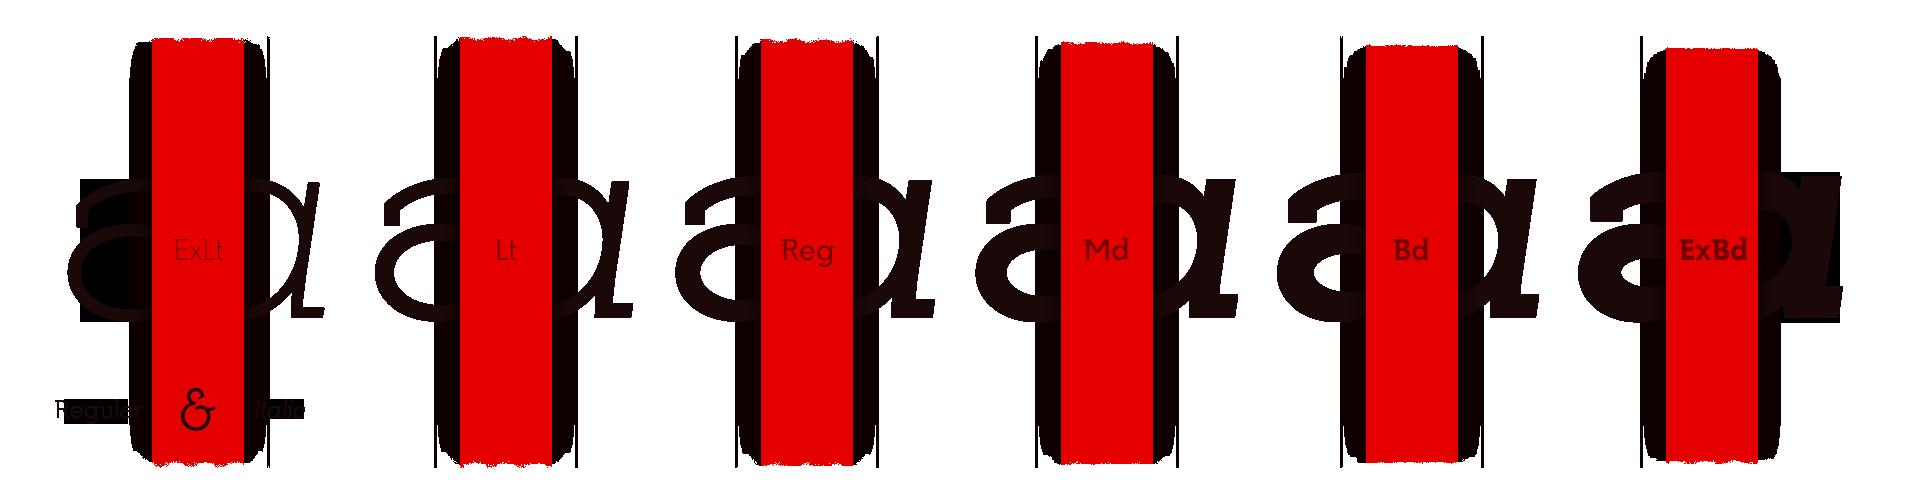 Getho Semi Sans Typeface Family